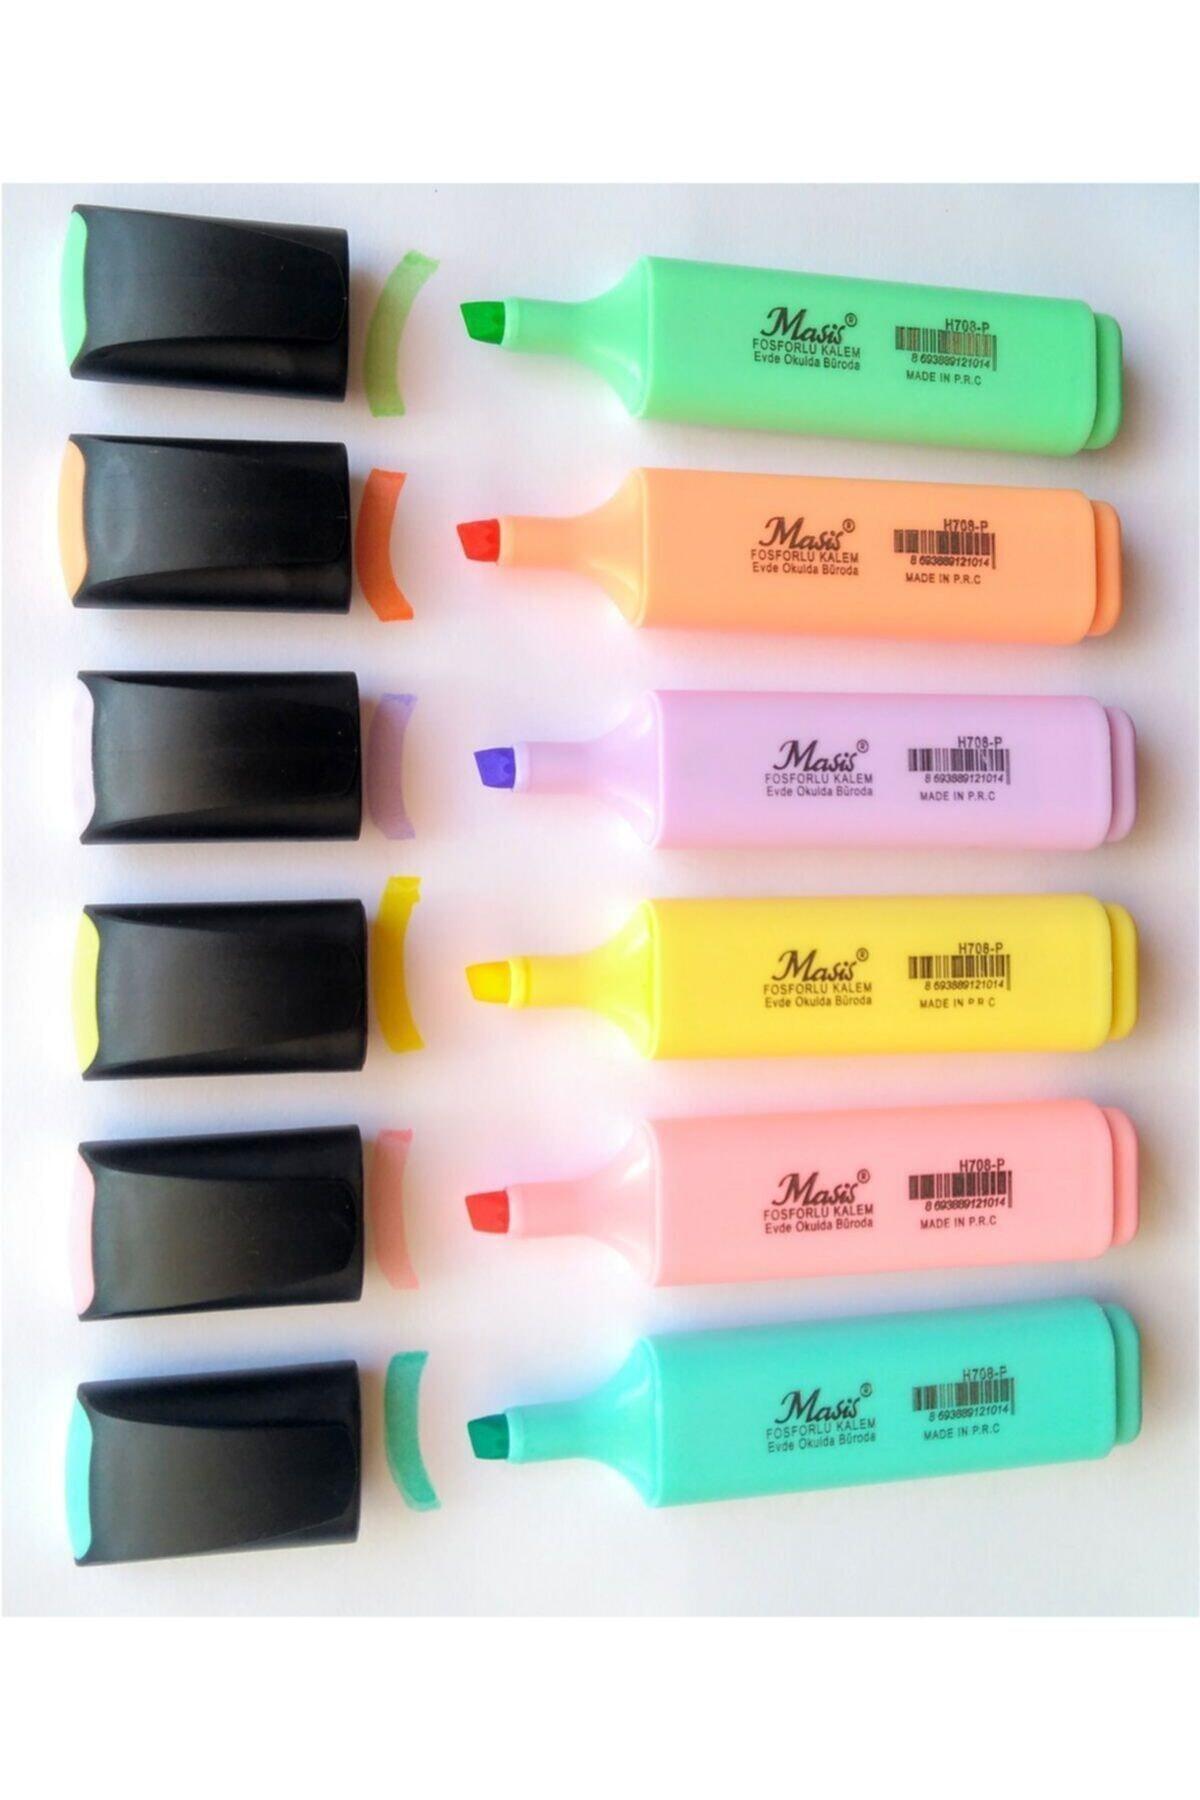 Masis Pastel Renk Fosforlu Işaretleme Kalemi 6 Lı Set 1